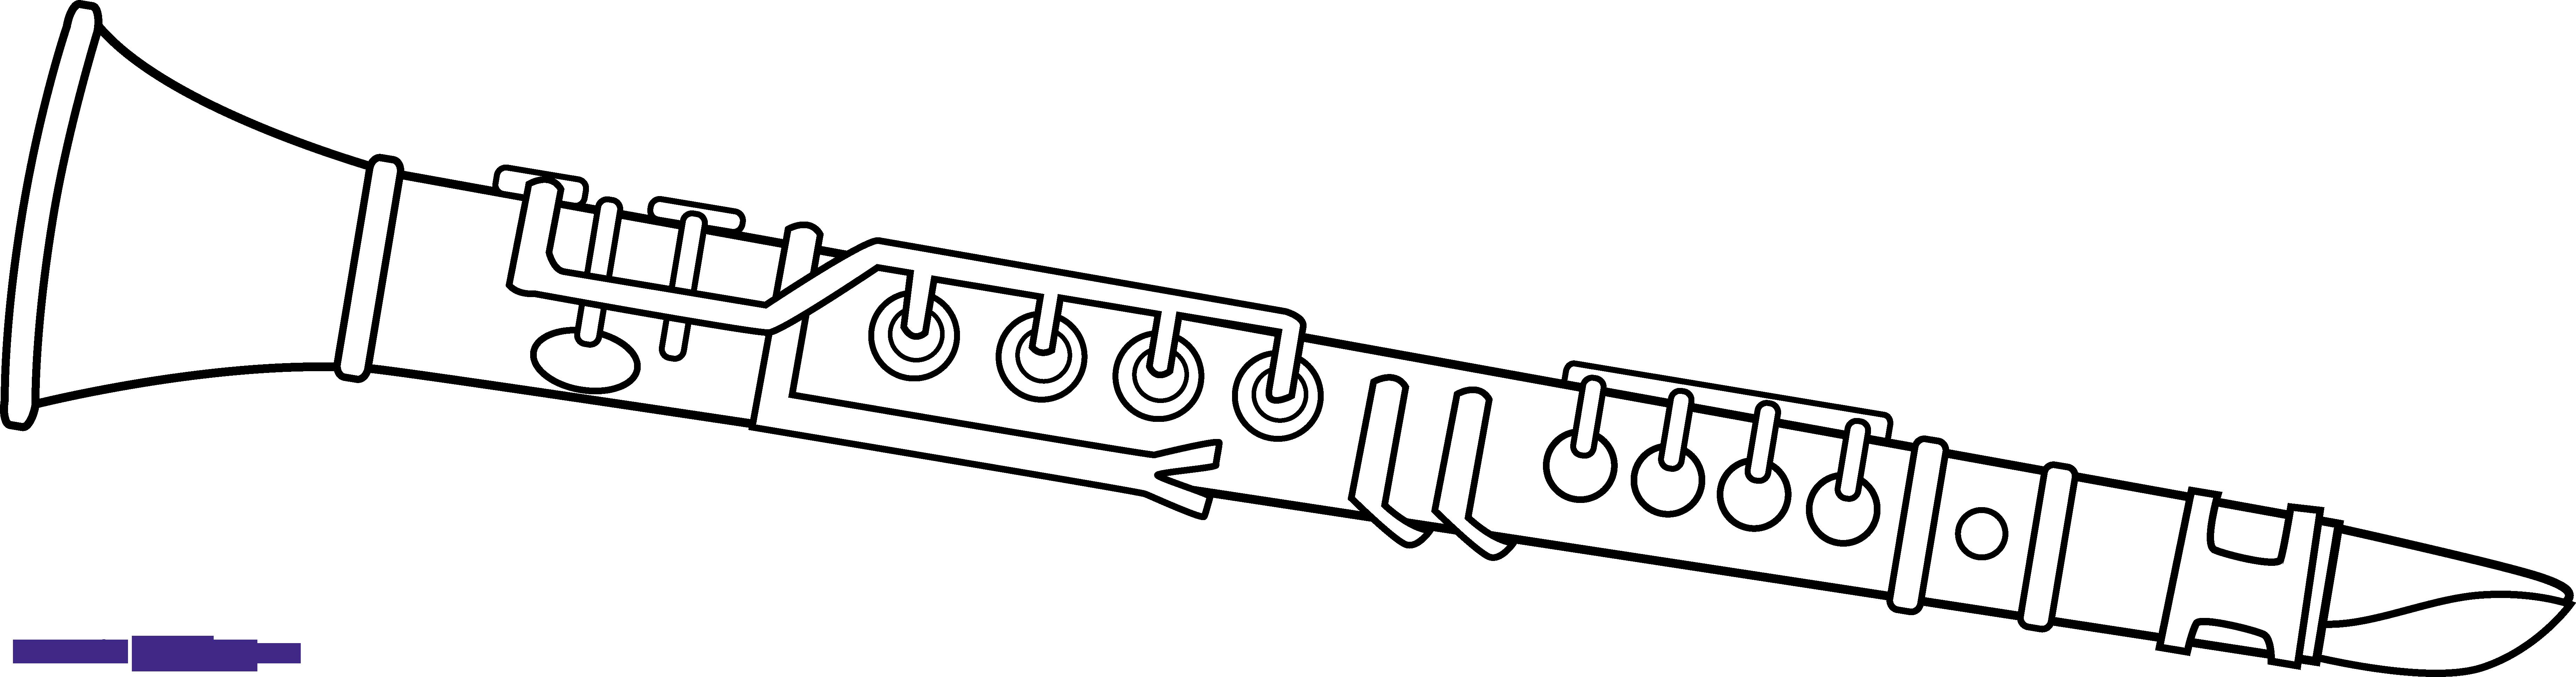 Cute frames illustrations hd. Clarinet clipart sketch